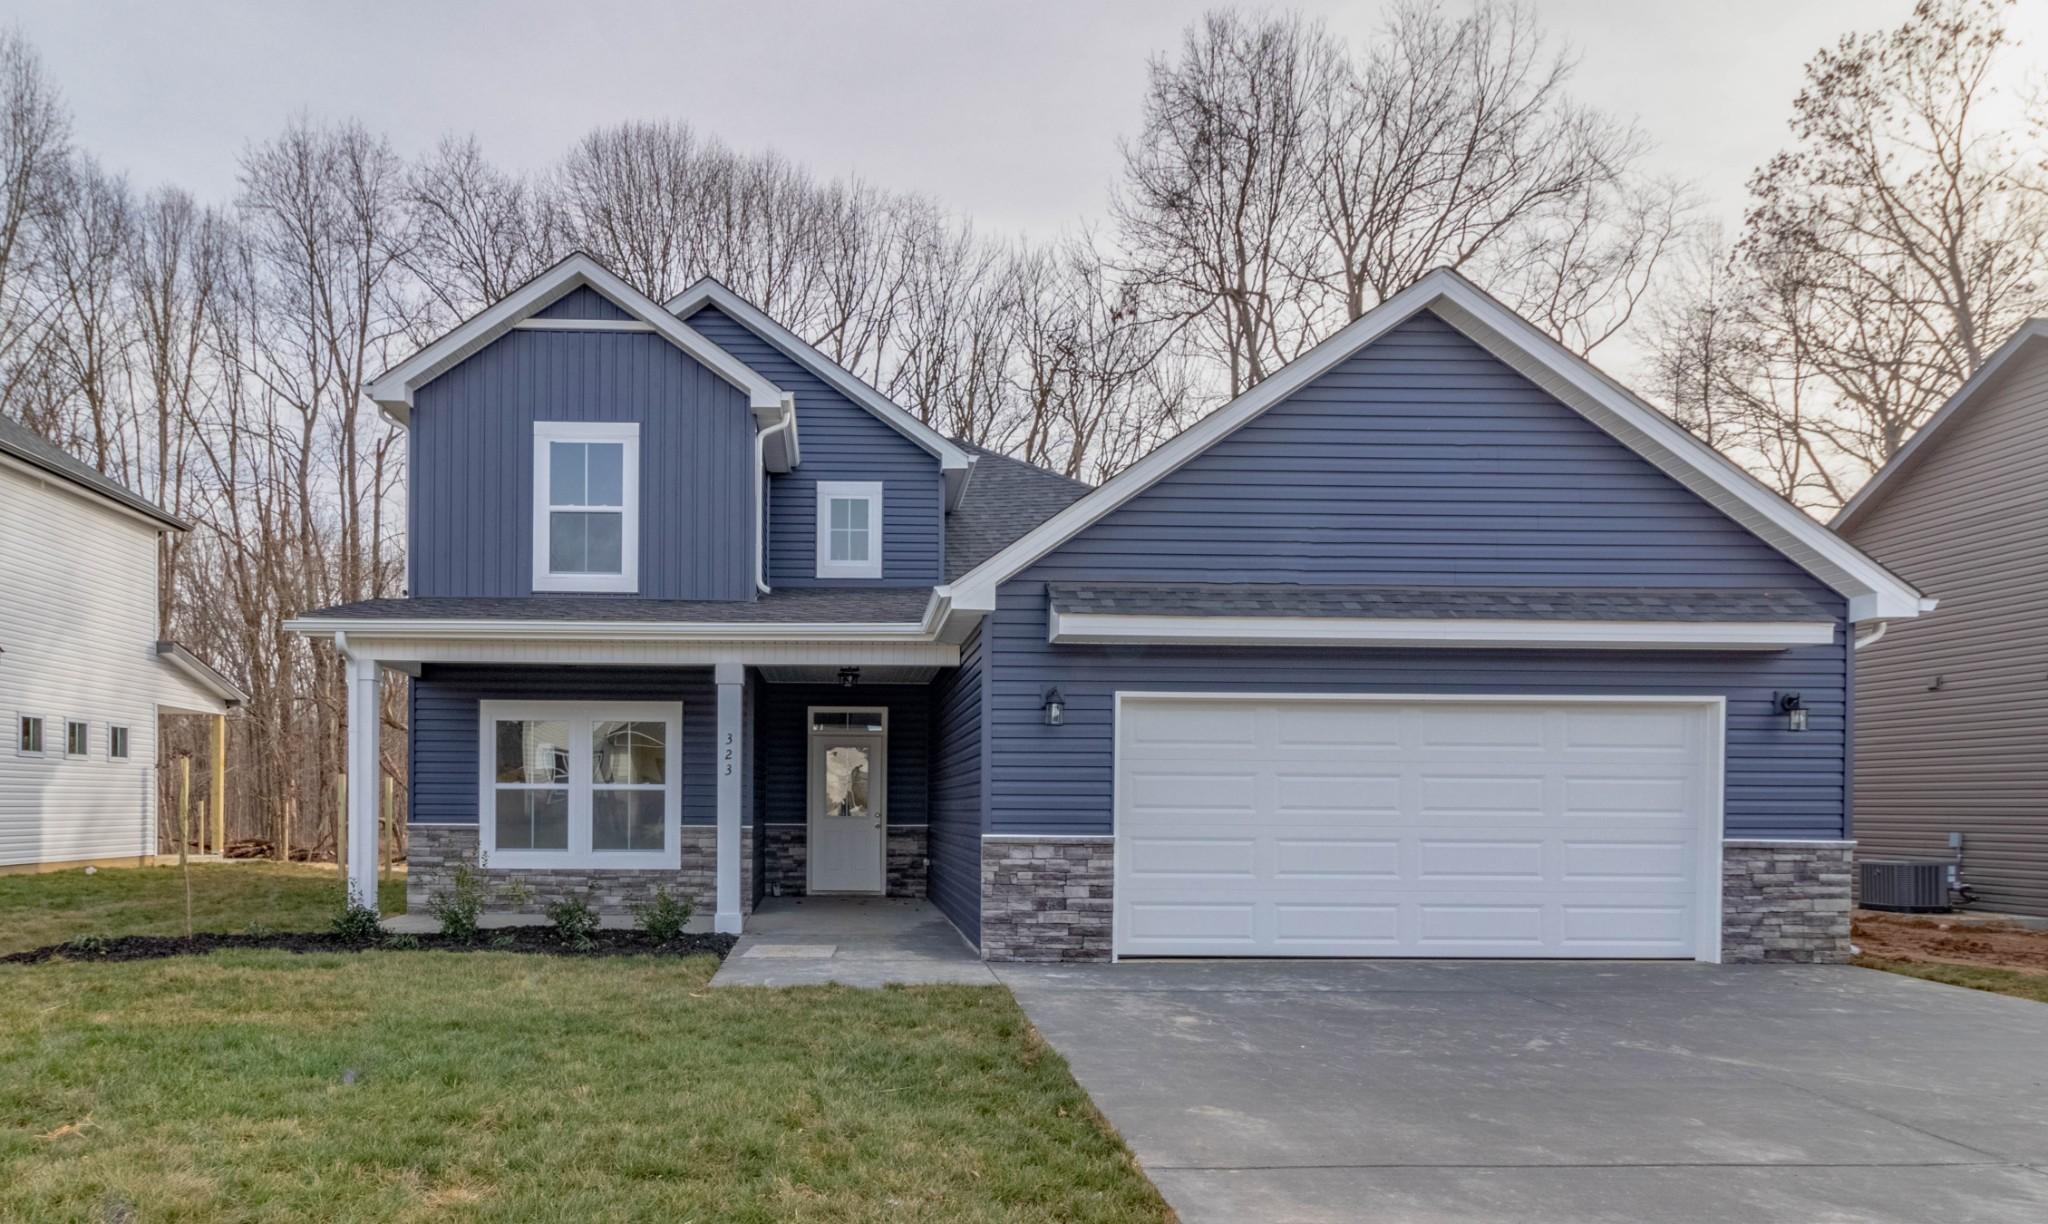 122 Sango Mills, Clarksville, TN 37043 - Clarksville, TN real estate listing